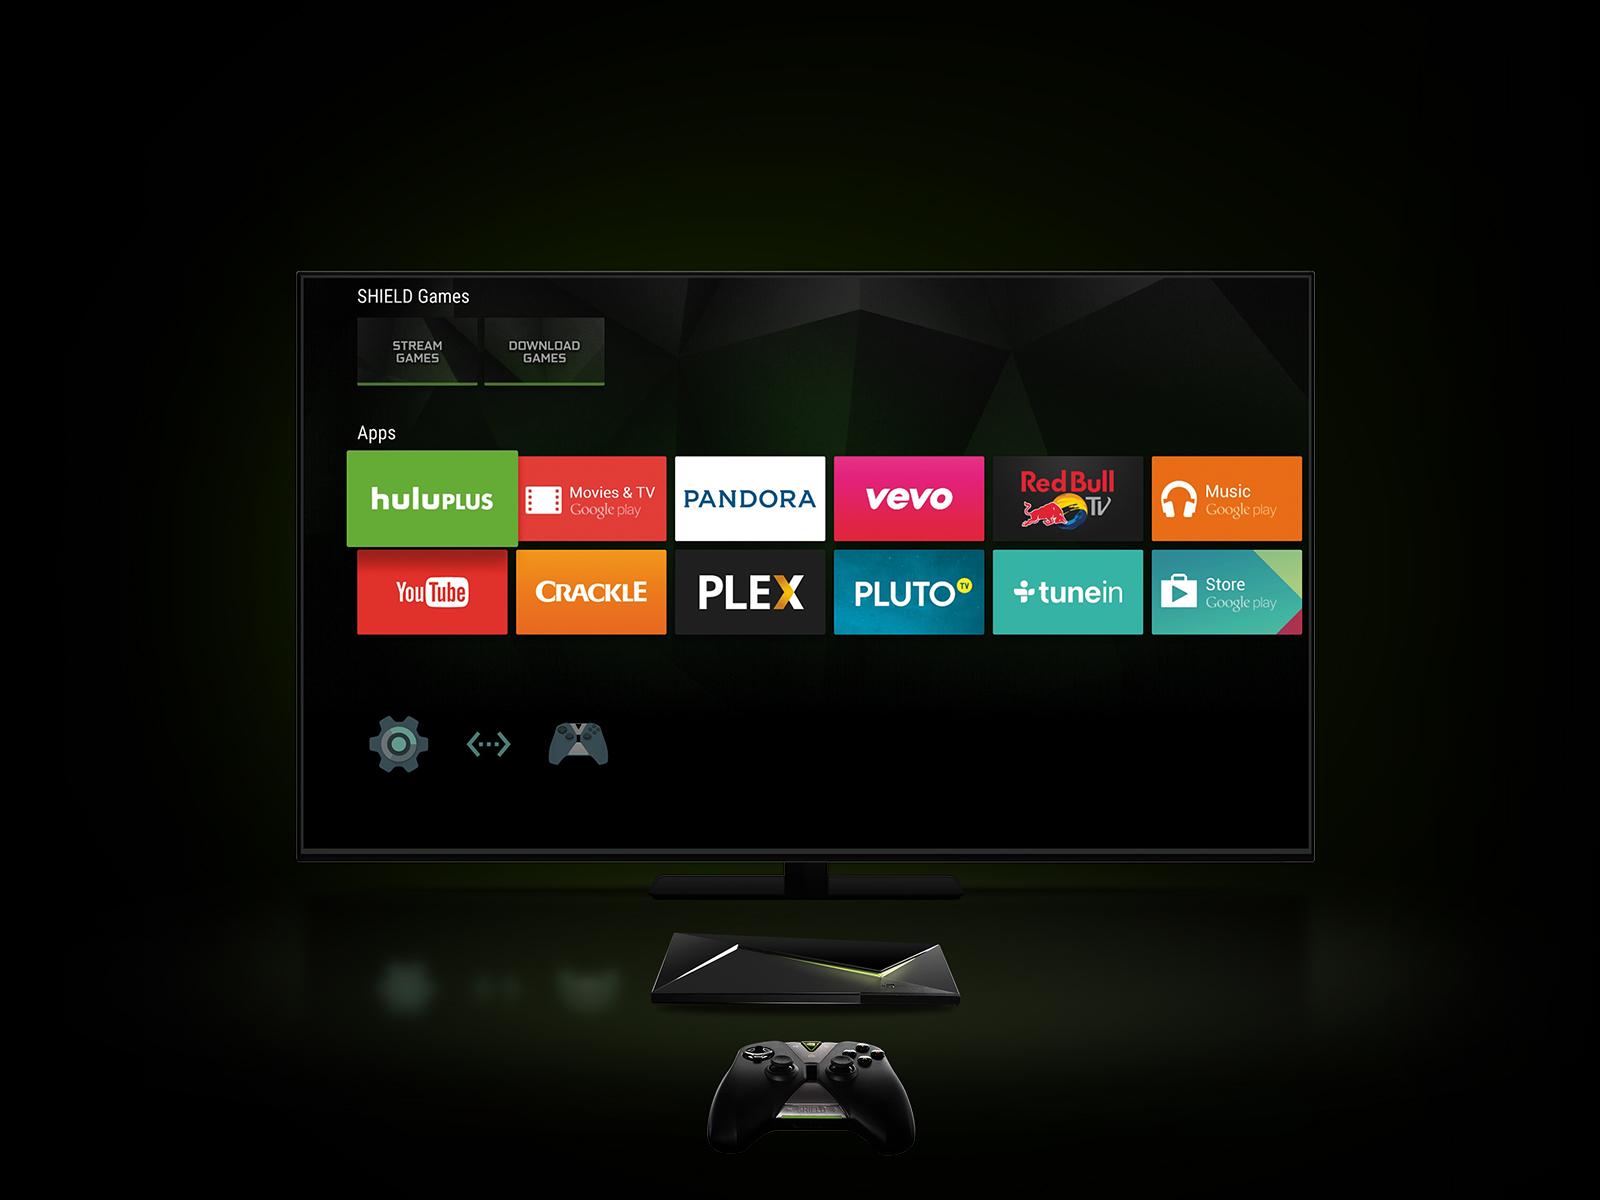 nvidia-shield-m2g-poster-bg1.jpg